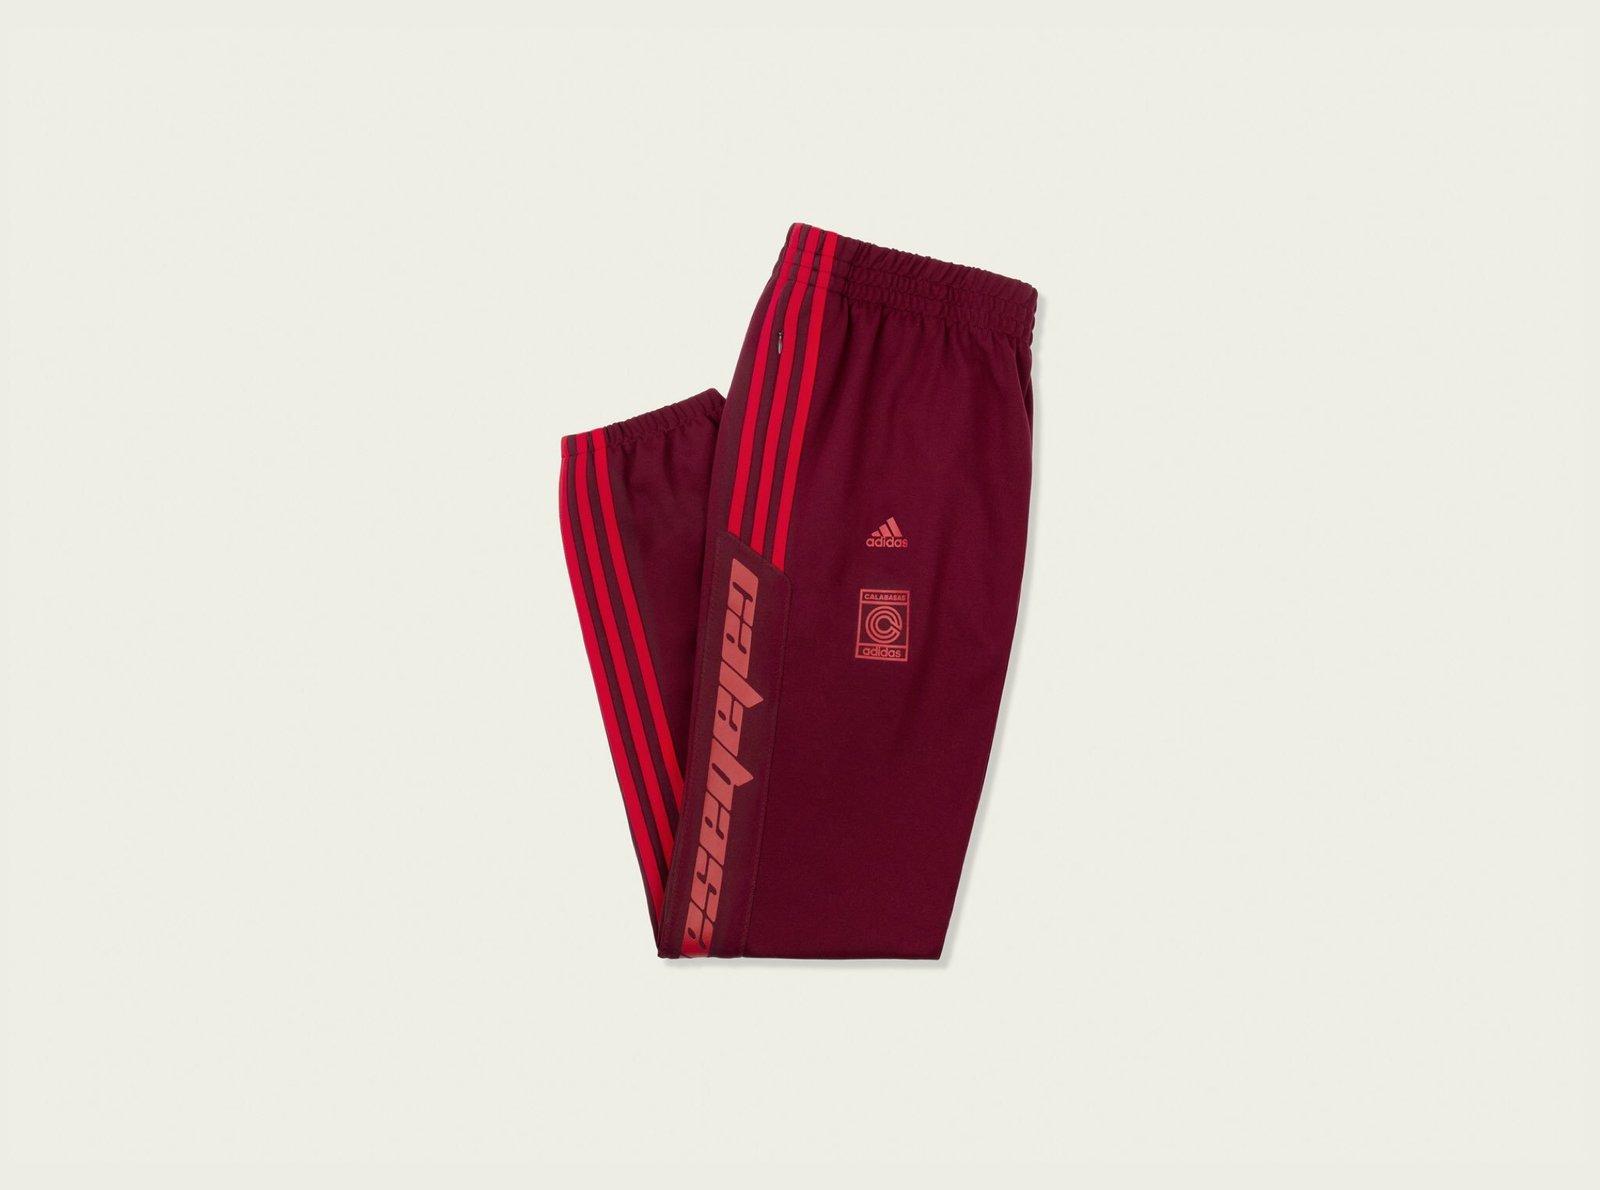 b7ce9bd4bfd3 Karan s Kicks — Adidas Yeezy Calabasas Track Pants Maroon